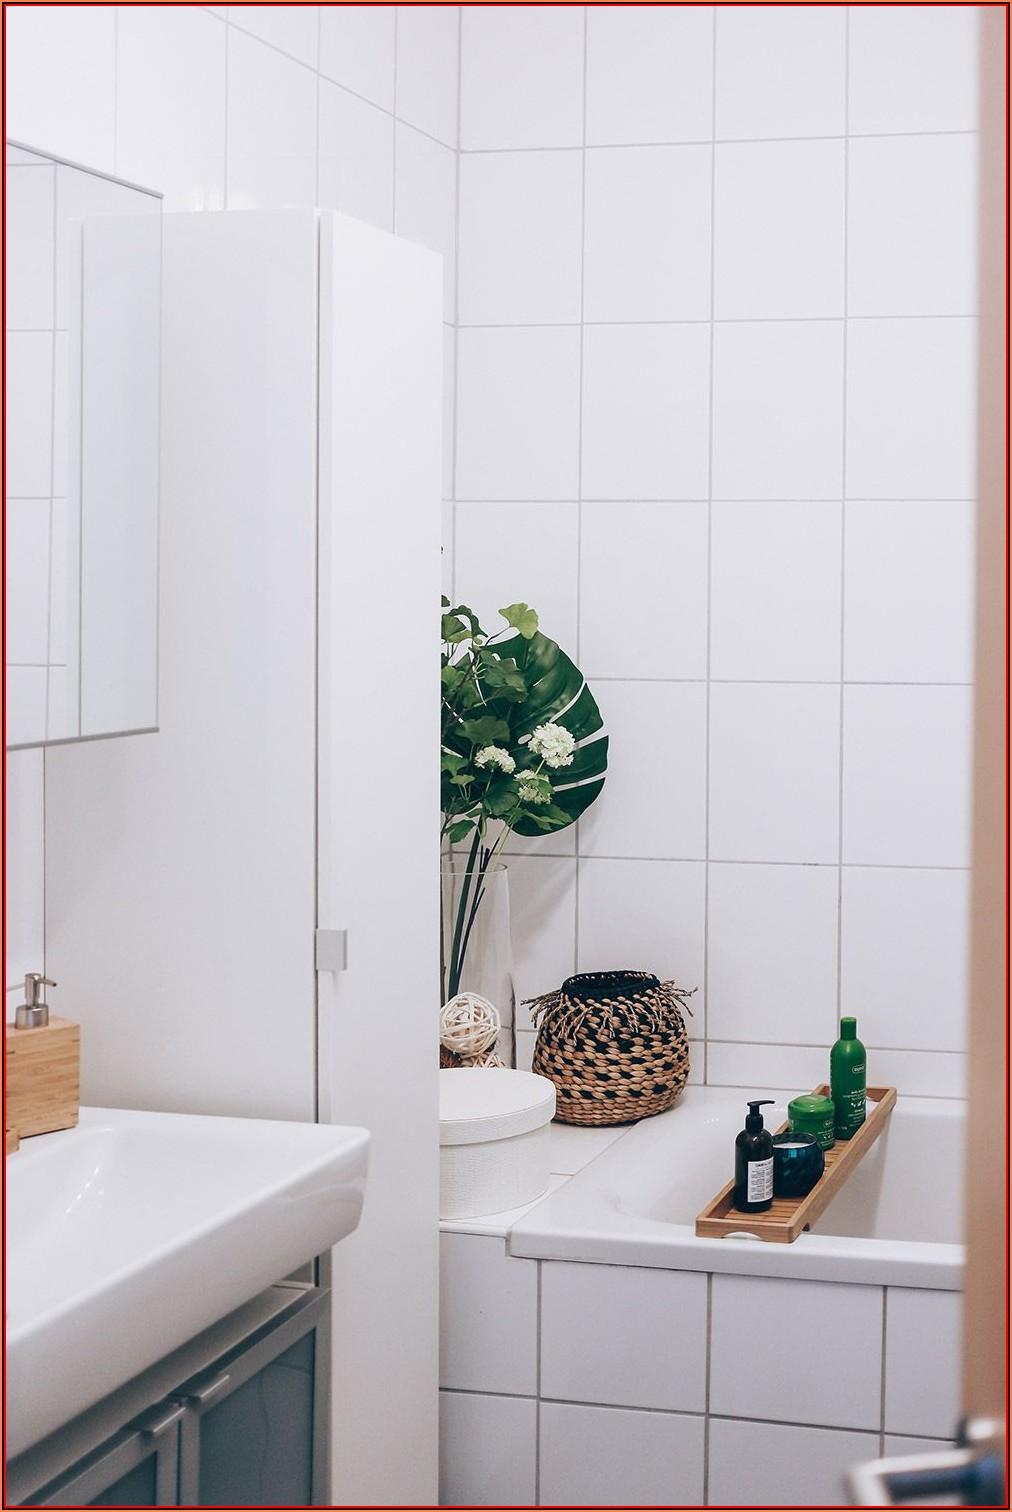 Deko Badezimmer Ohne Fenster